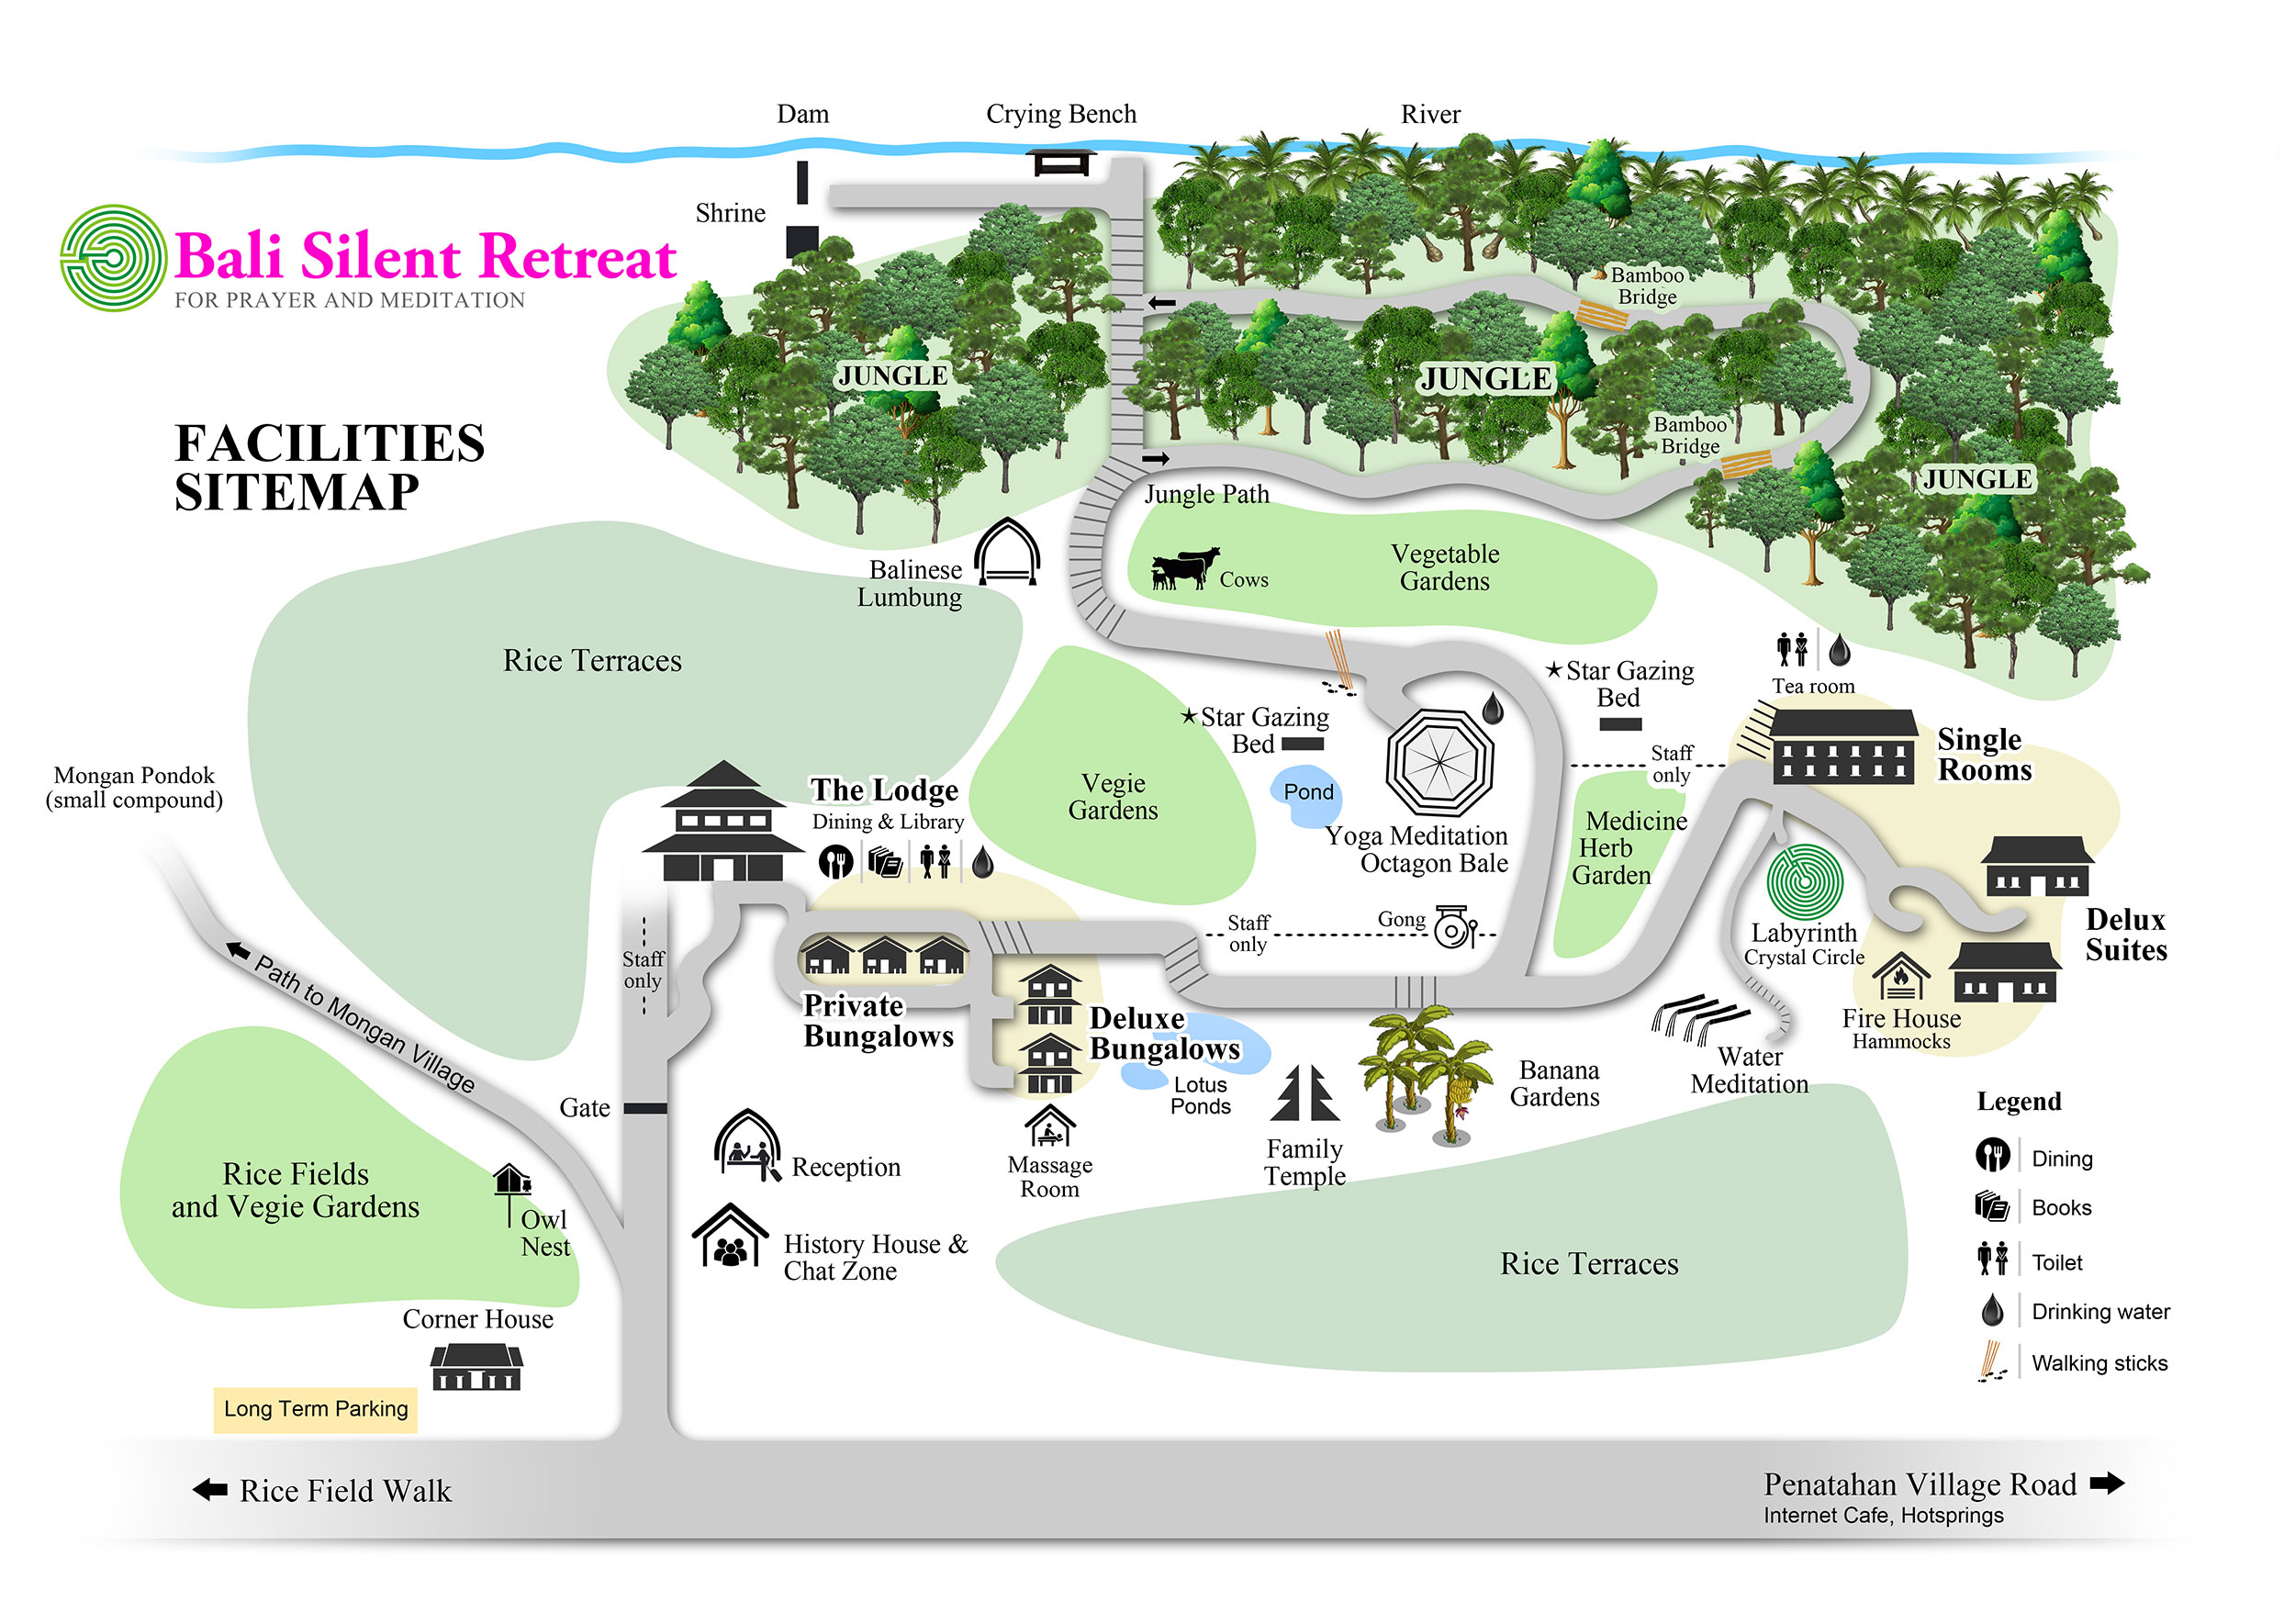 Facilities Sitemap - Bali Silent Retreat